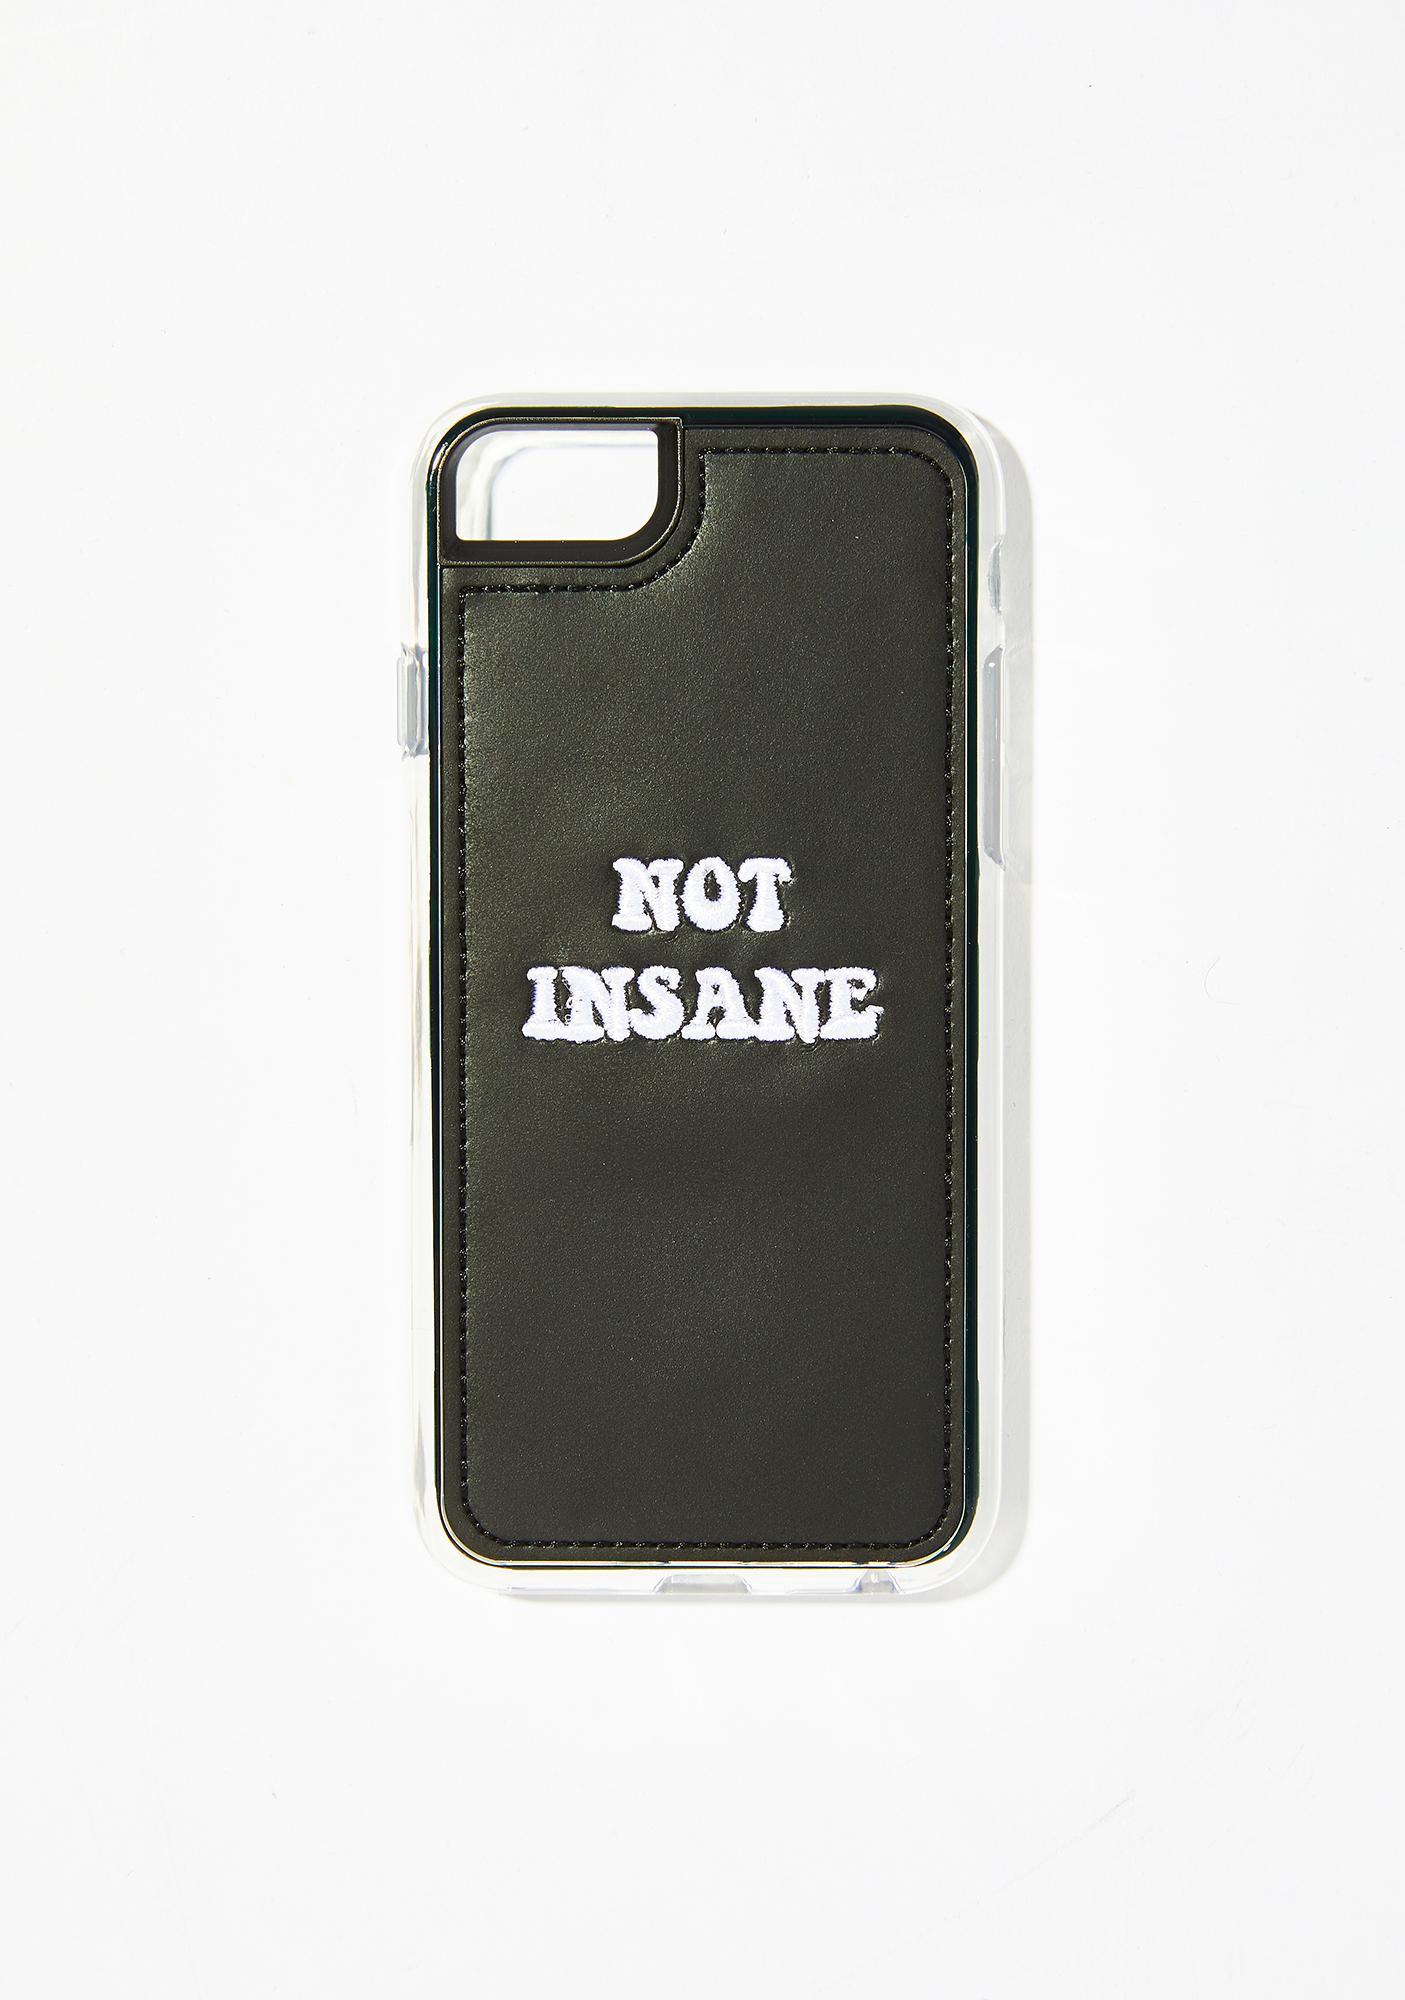 Zero Gravity Insane Embroidered iPhone Case